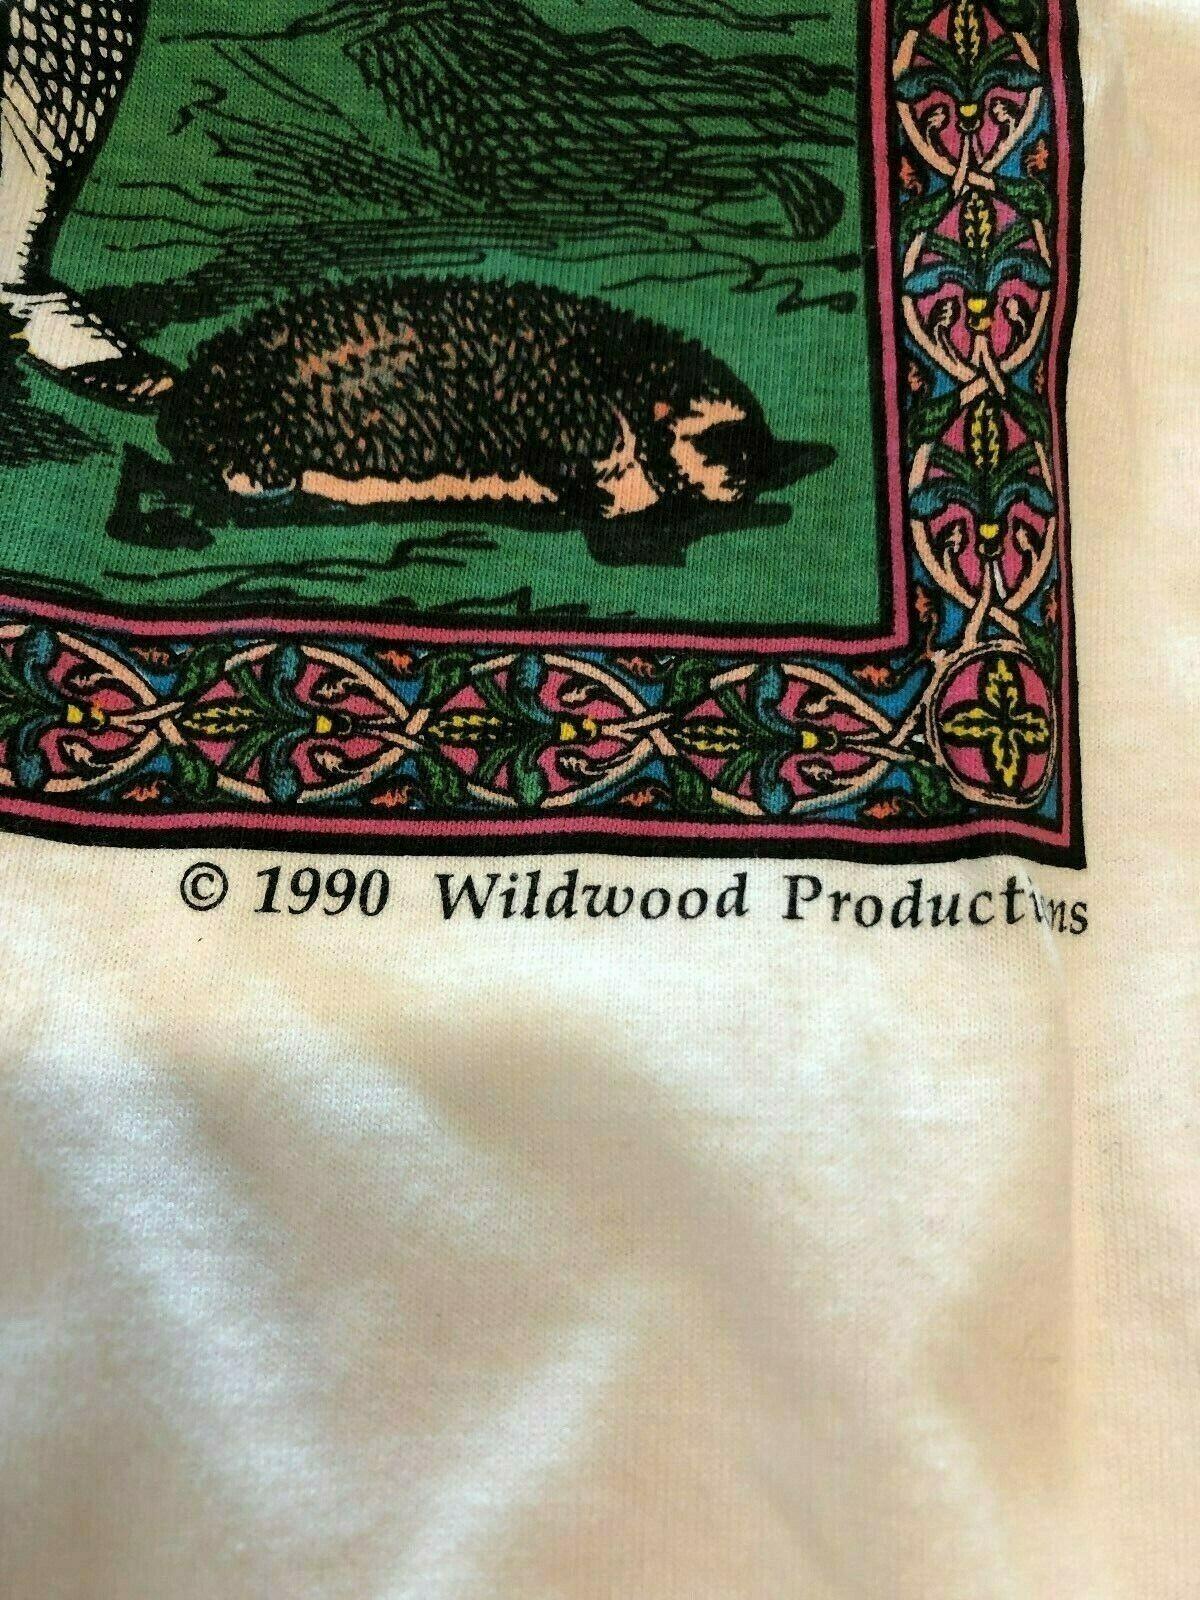 Vintage T Shirt - John Tenniels Illustrations Of … - image 3